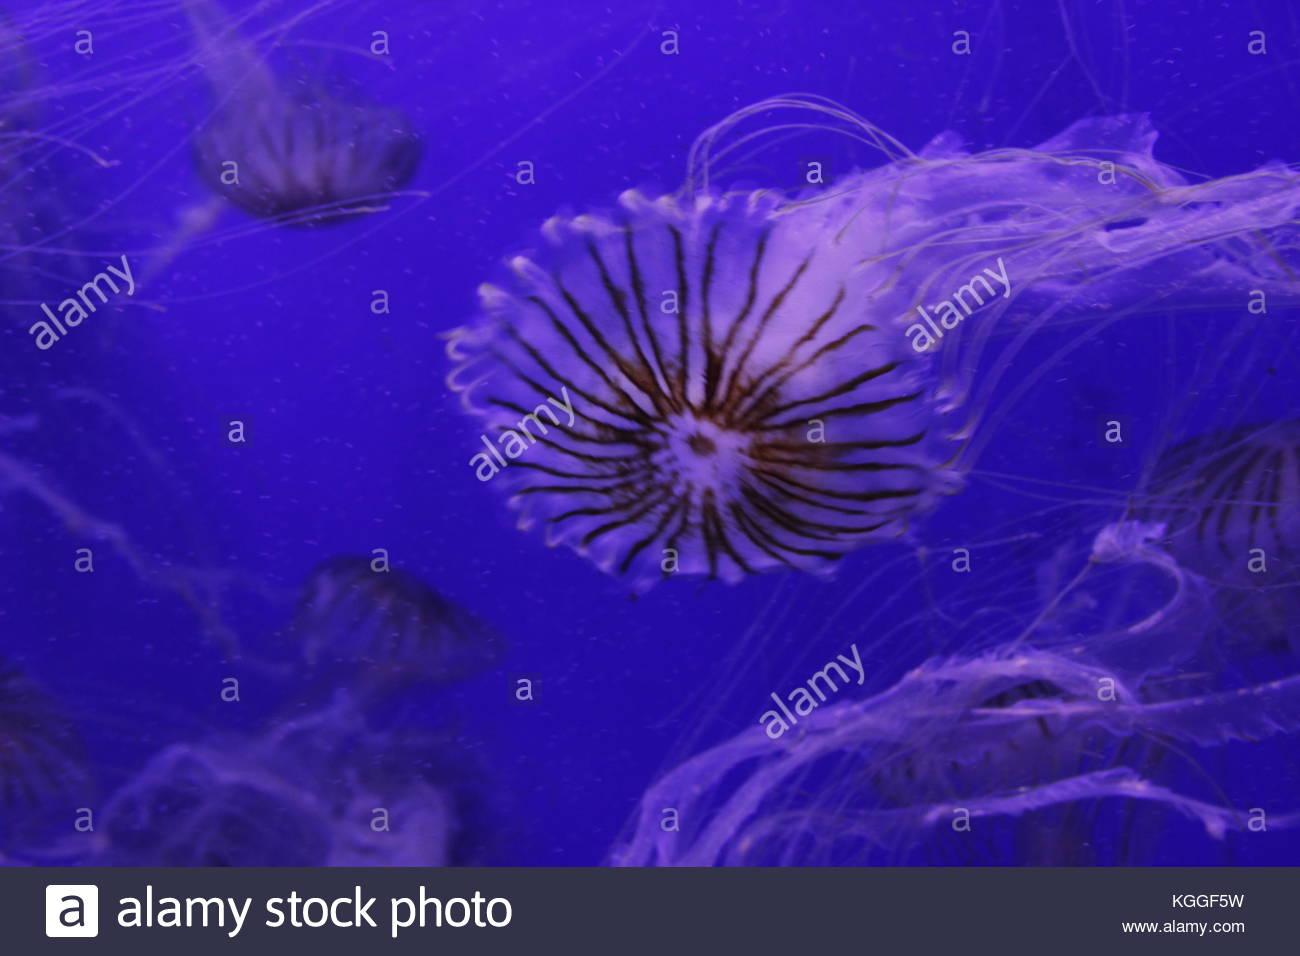 Marine organism - Stock Image